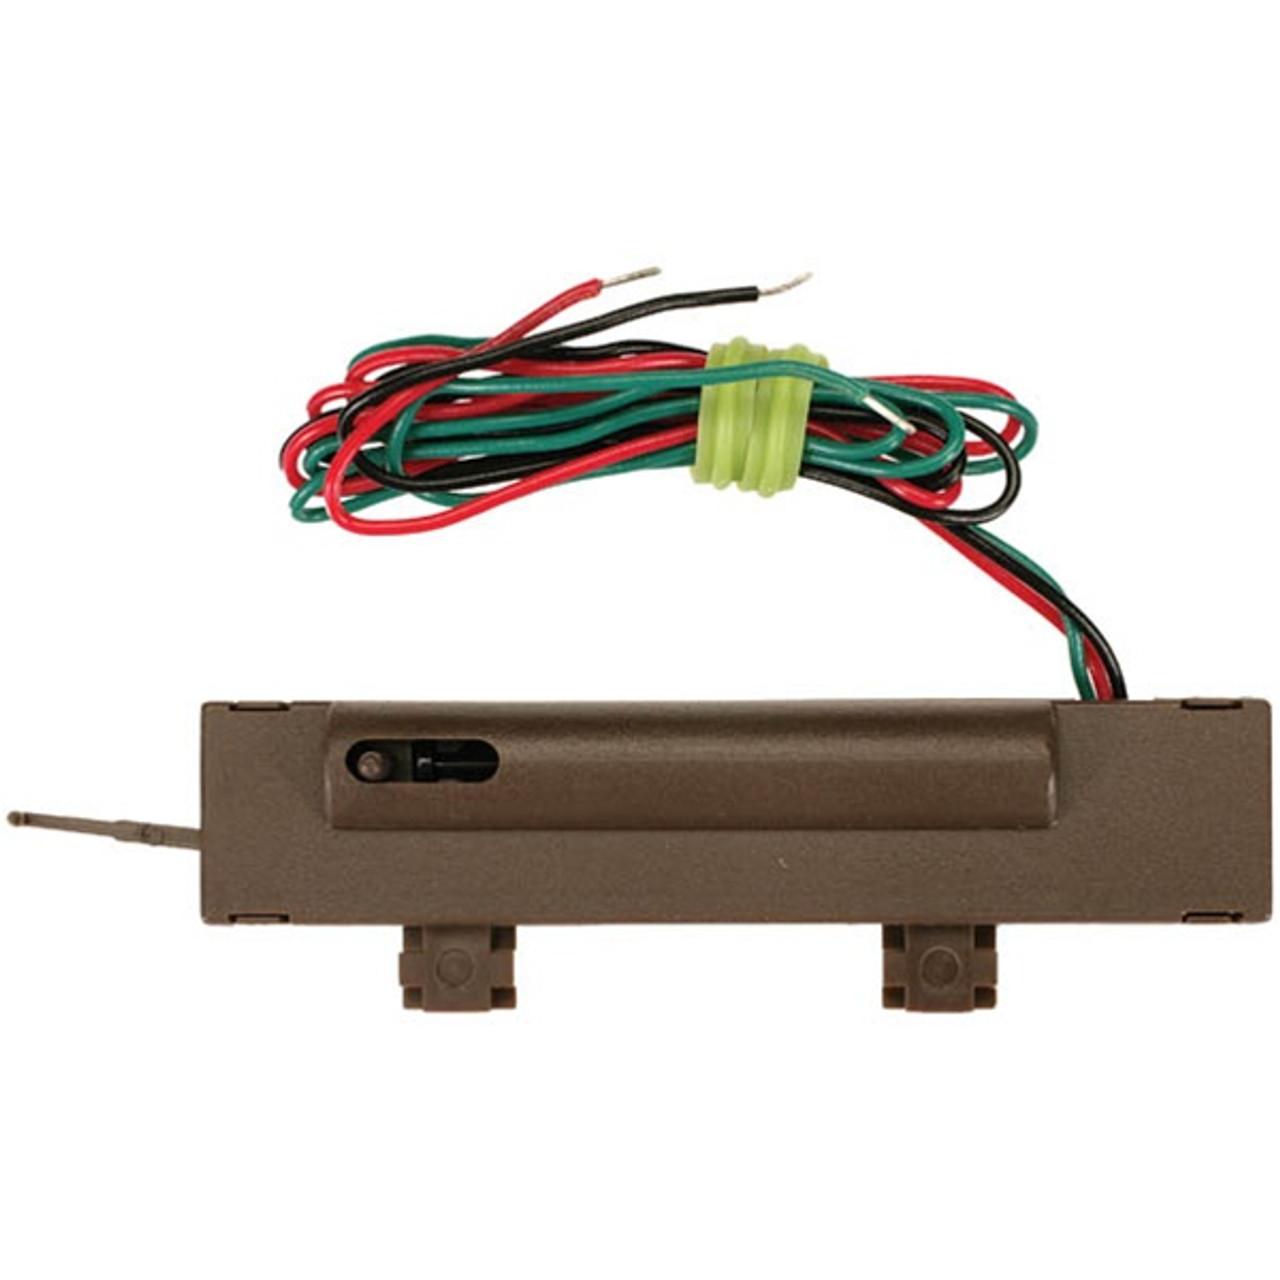 medium resolution of atlas ho 585 code 83 track right hand remote switch machineatlas ho 585 code 83 track